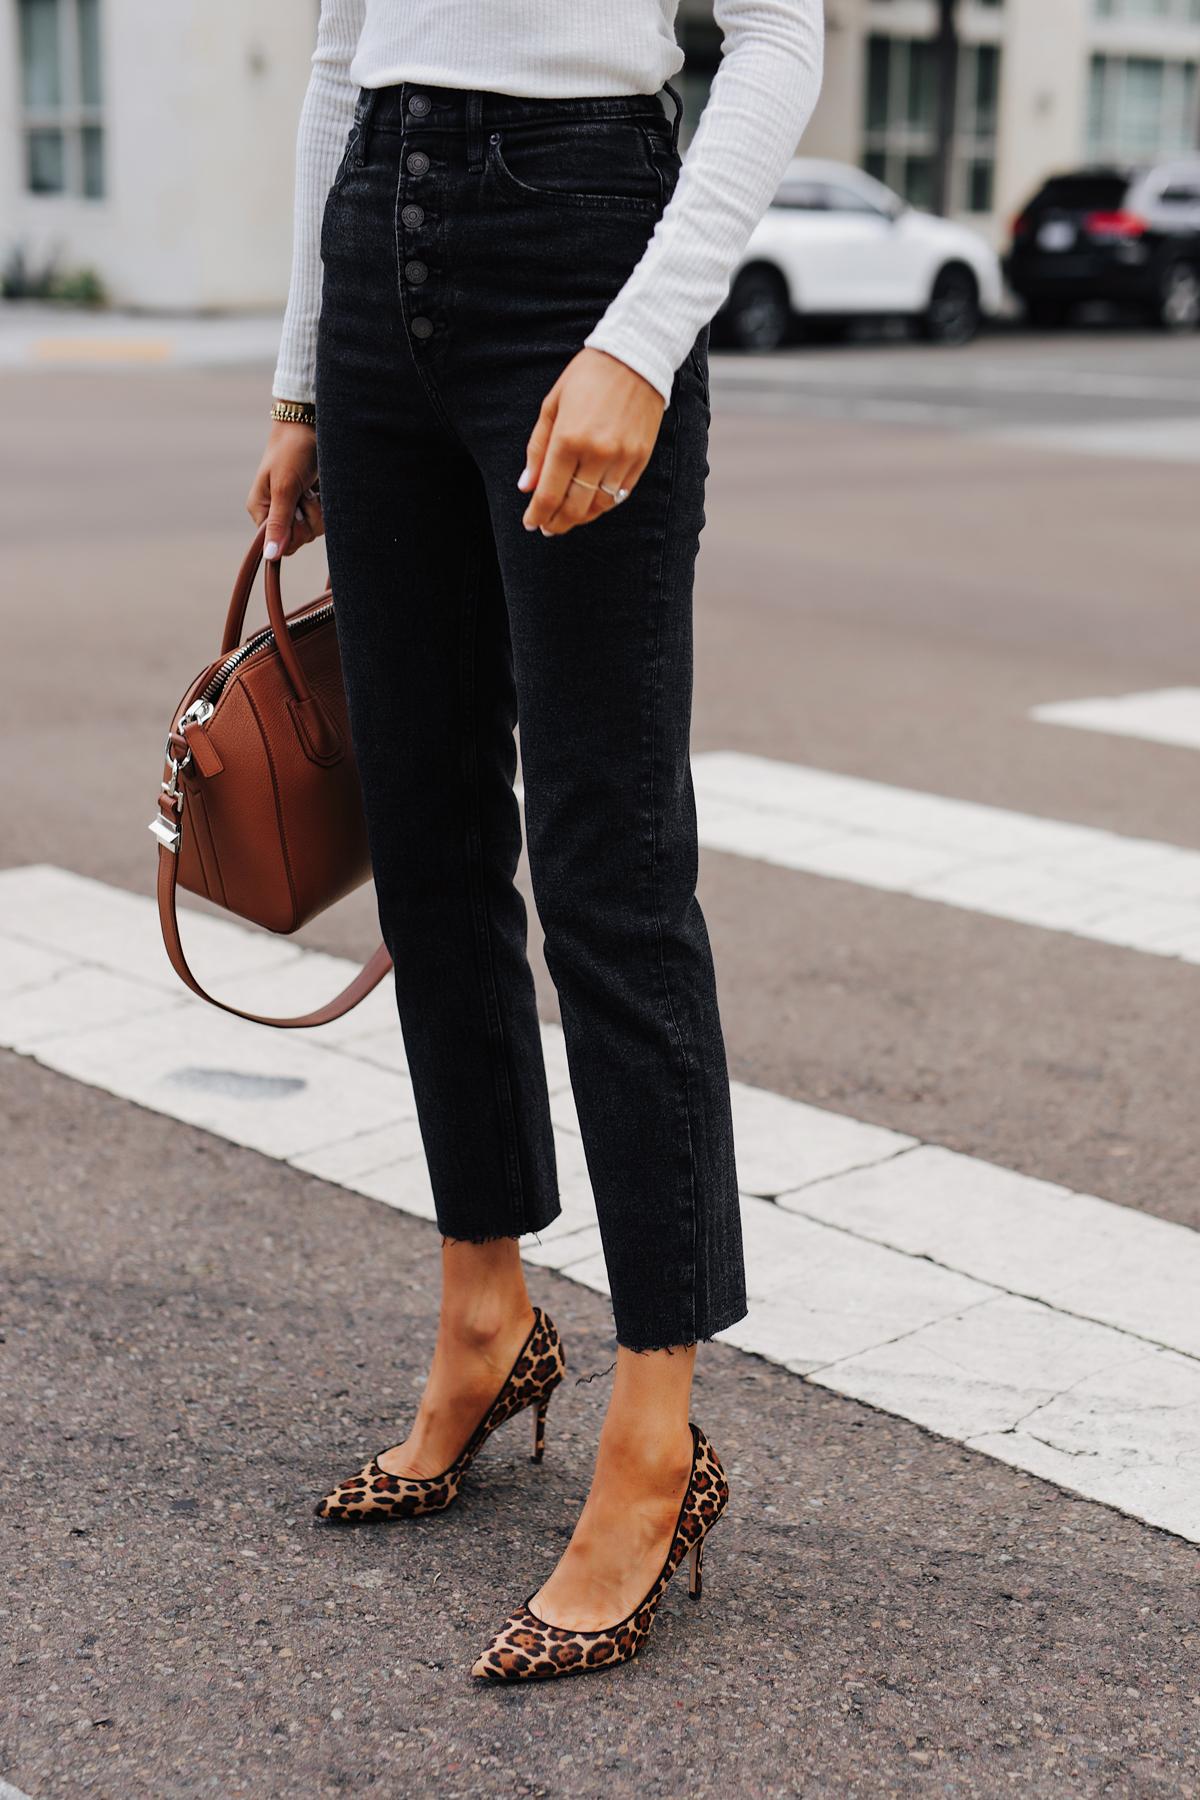 Fashion Jackson Wearing Abercrombie Black Button Front Raw Hem Mom Jeans Leopard Pumps